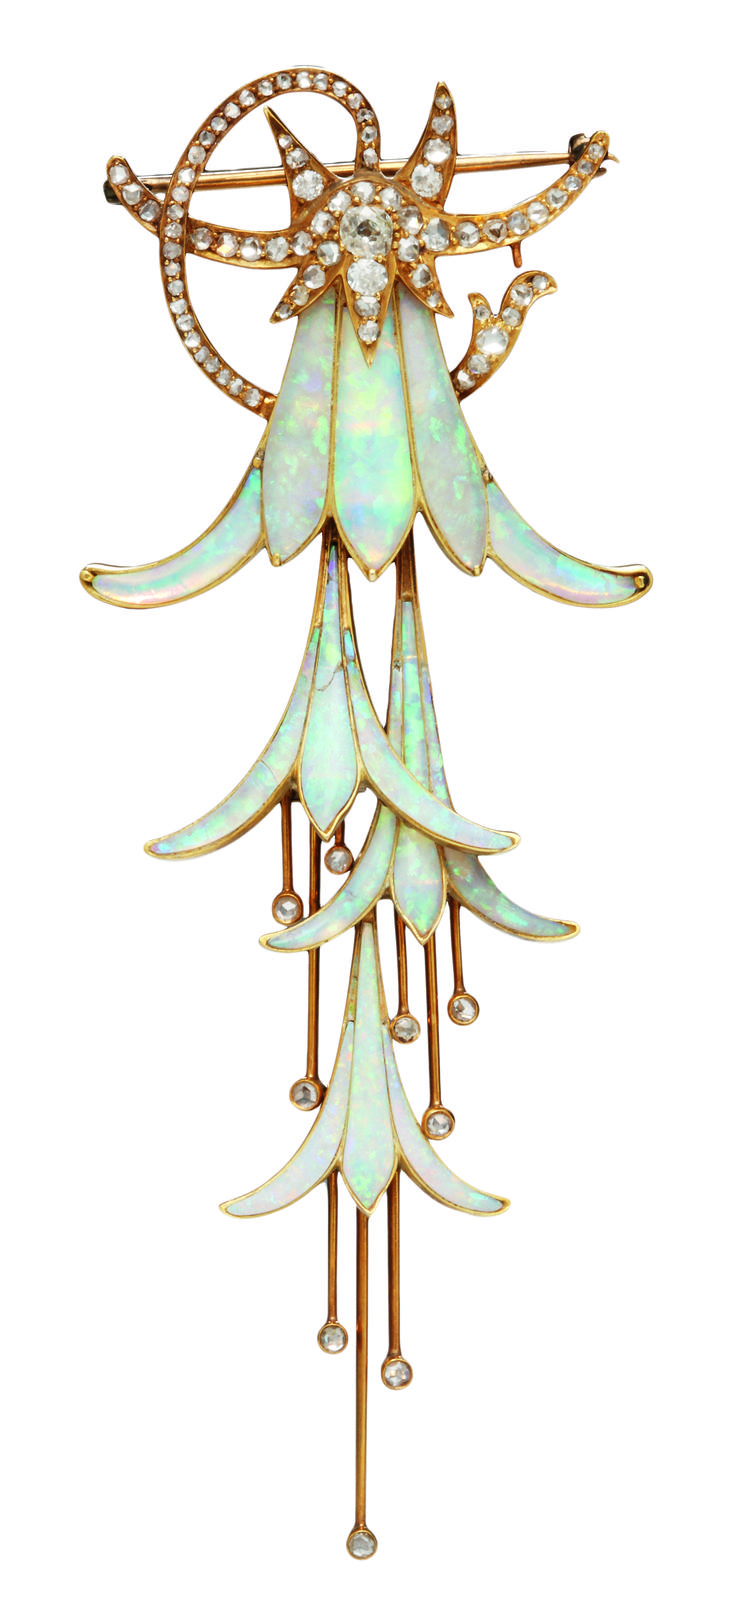 Georges Fouquet, fuchsia brooch - 1902 - Paris - Hessisches Landesmuseum Darmstadt - Art Nouveau - http://www.hlmd.de/                                                                                                                                                                                 More